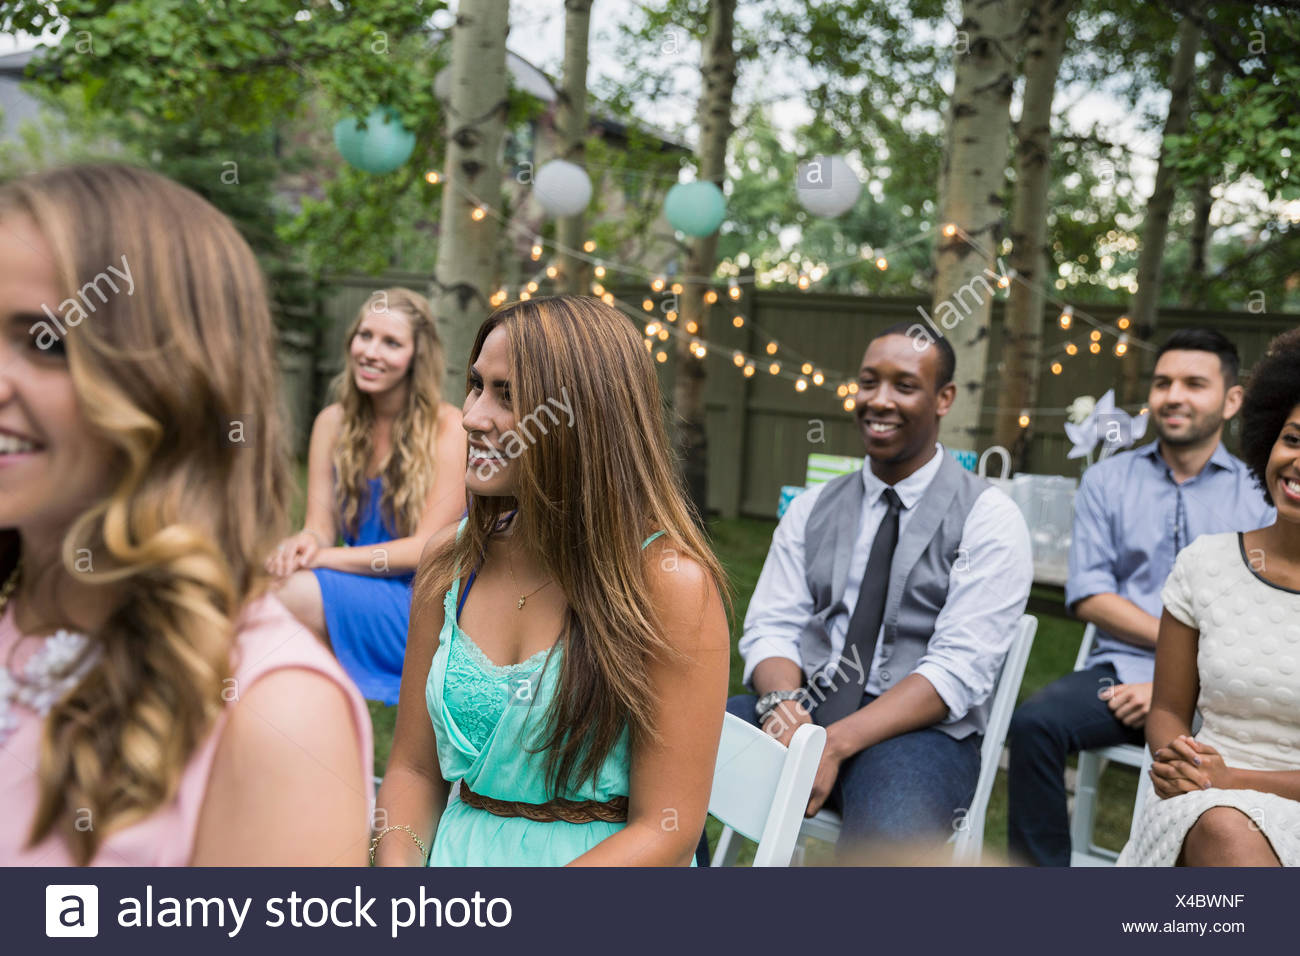 Smiling wedding guests enjoying backyard wedding - Stock Image